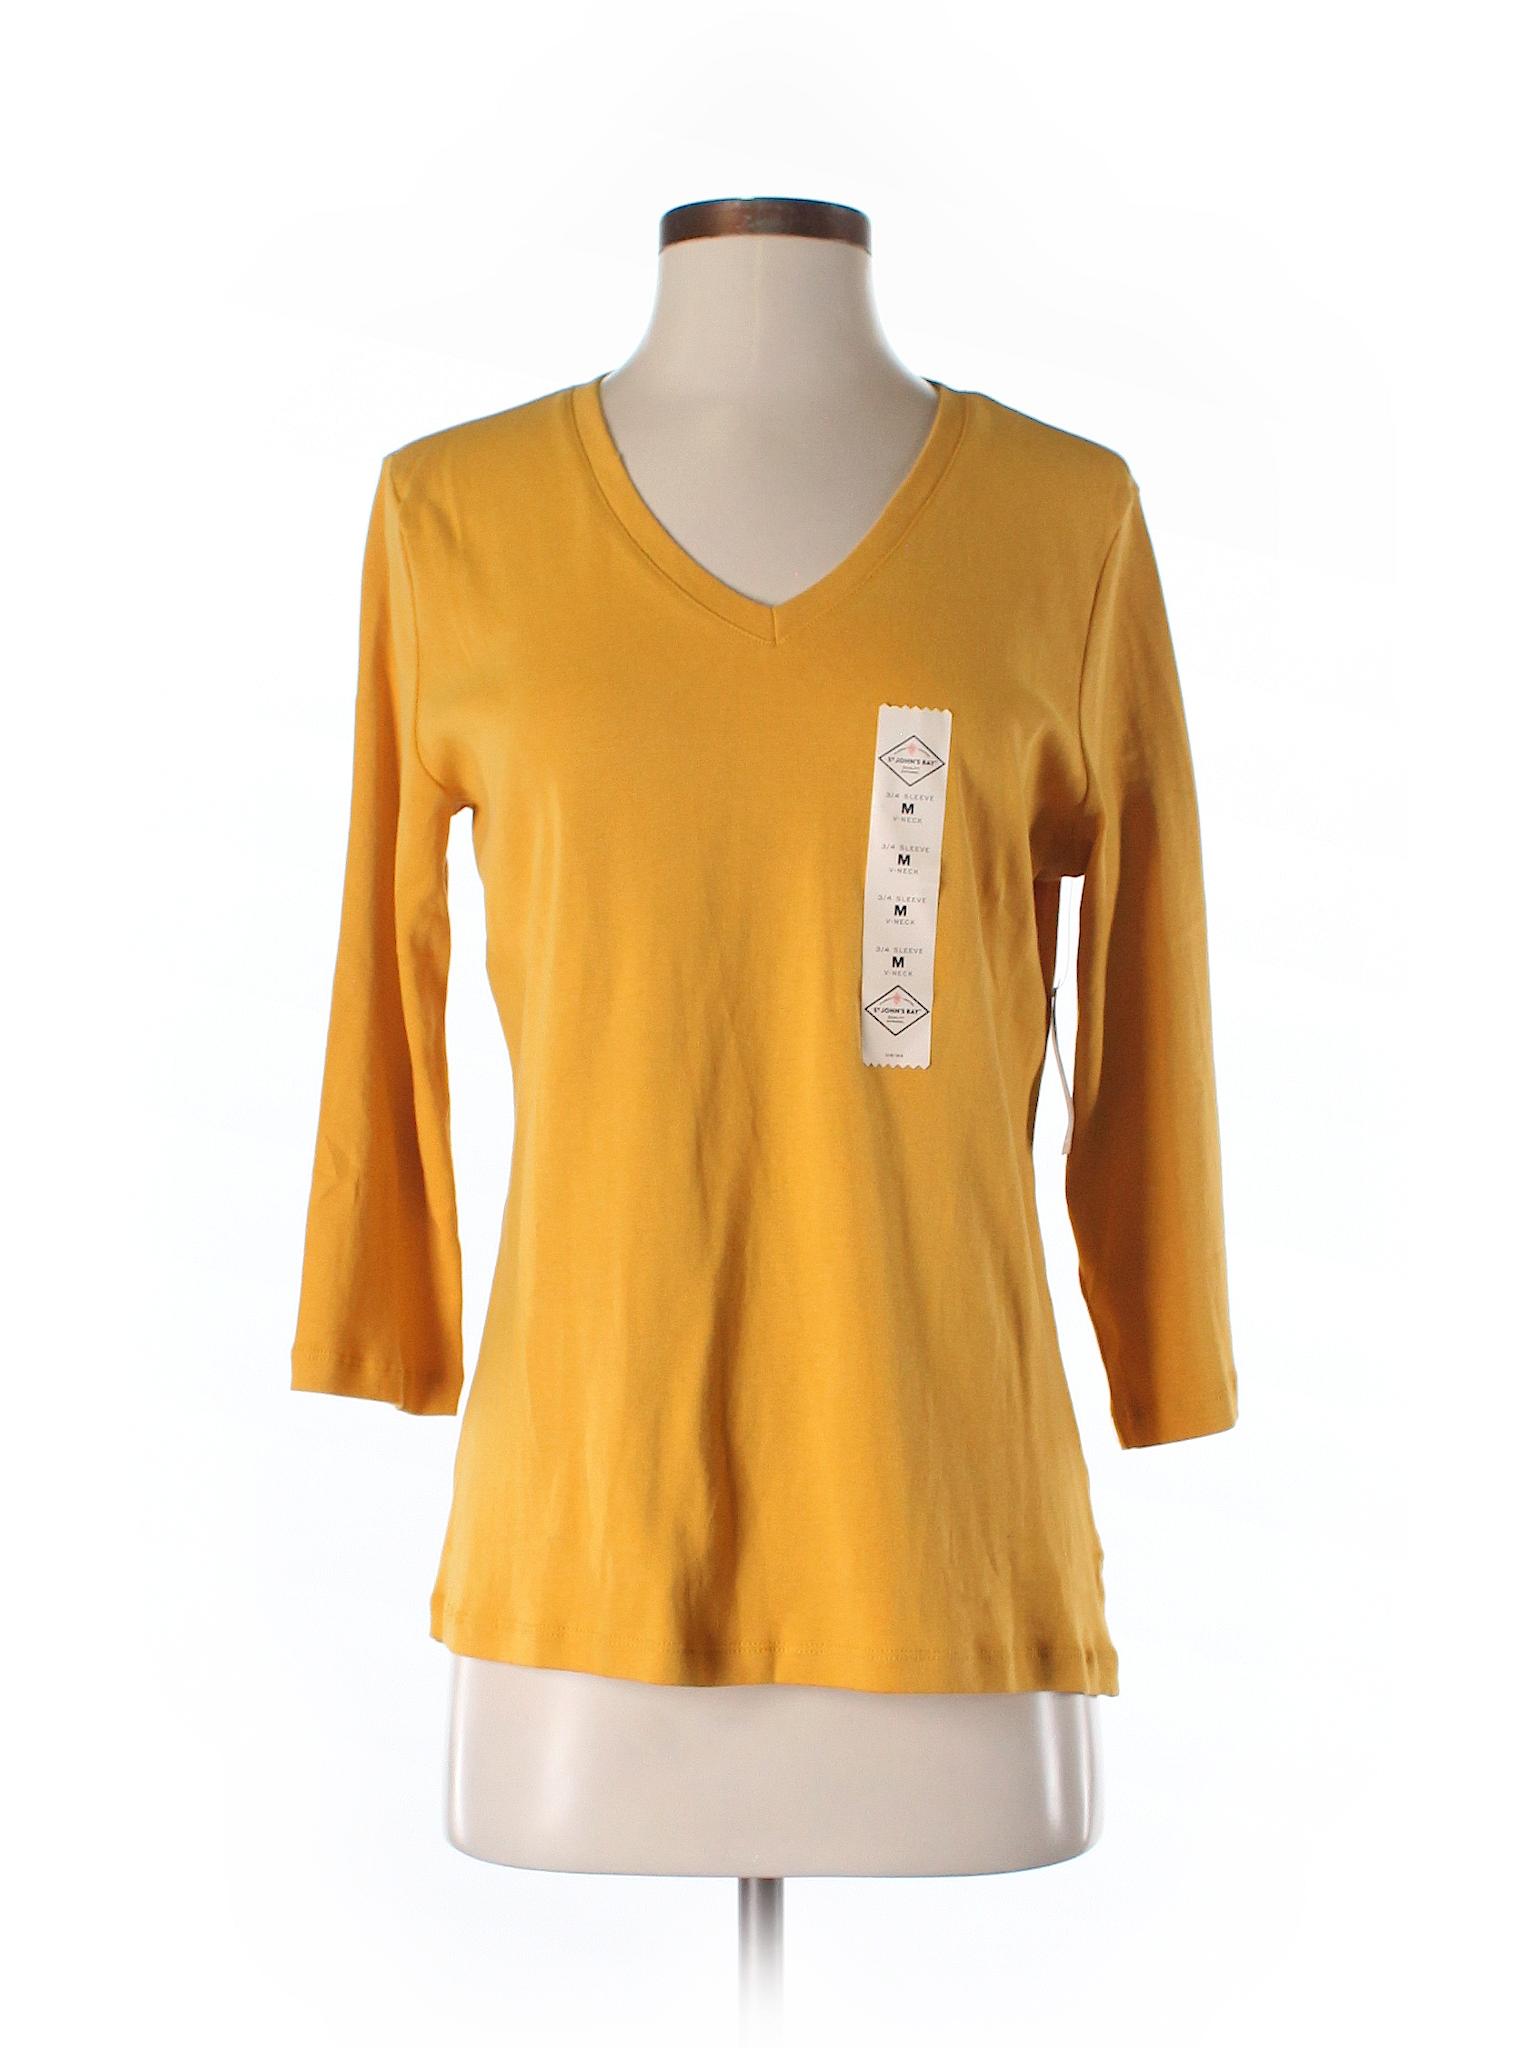 St John 39 S Bay 3 4 Sleeve T Shirt 43 Off Only On Thredup